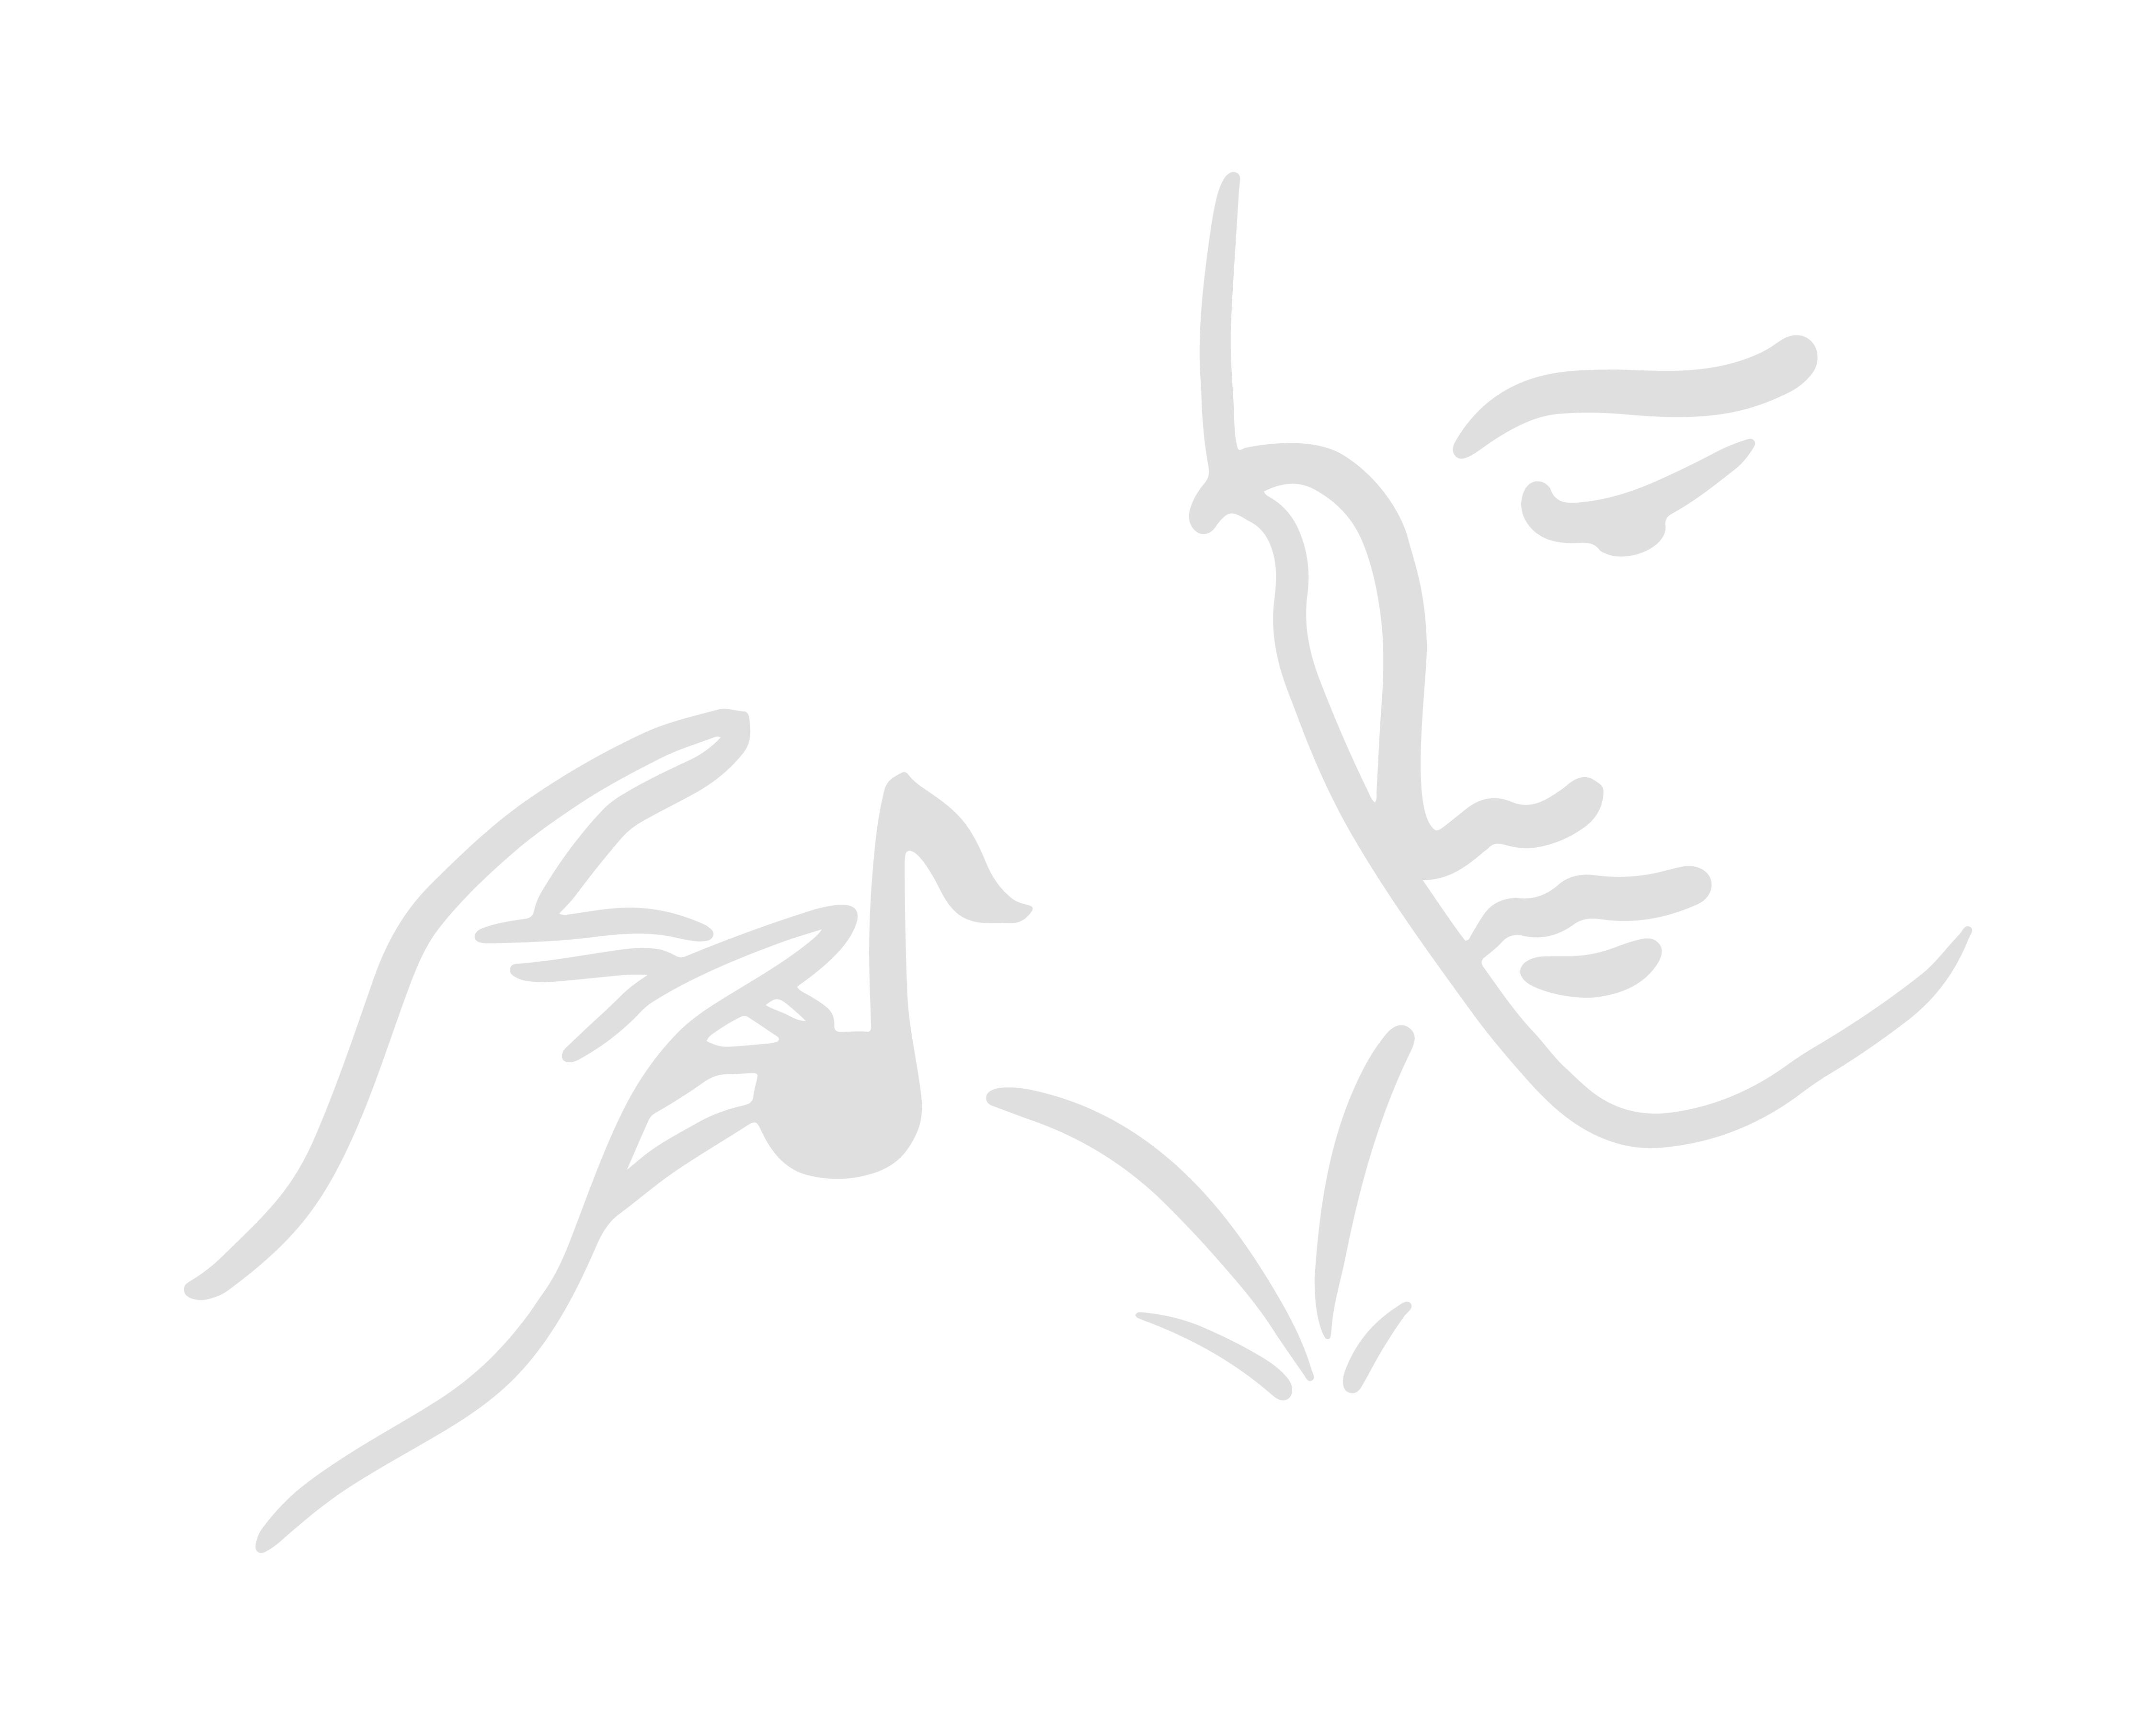 lwlvls_handnoteface_logo 1920x